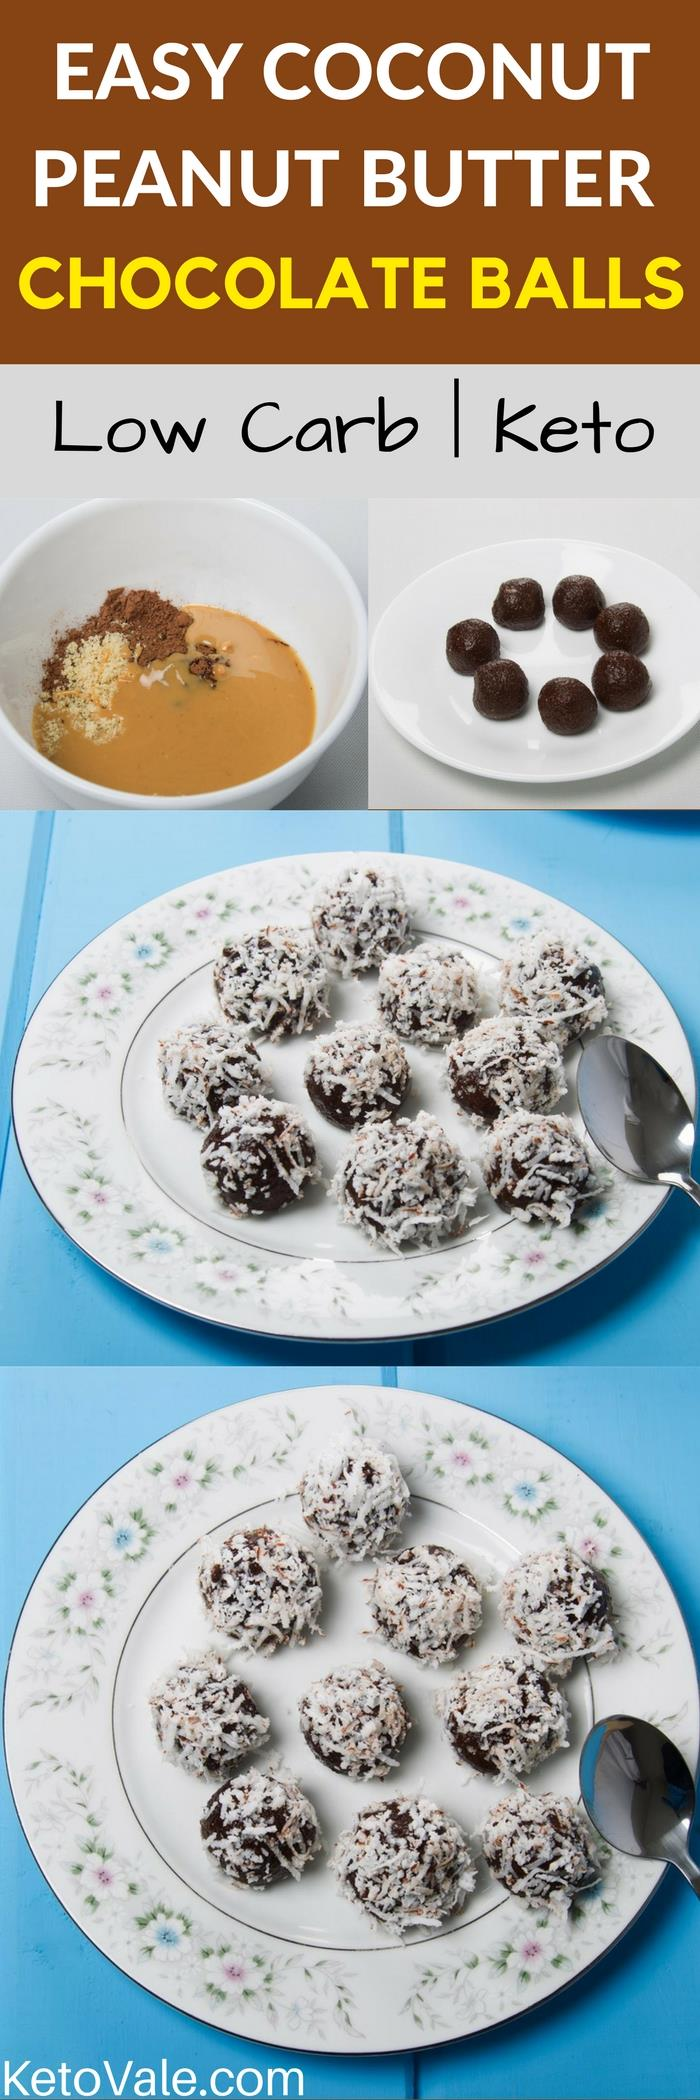 Coconut Peanut Butter Chocolate Balls Recipe